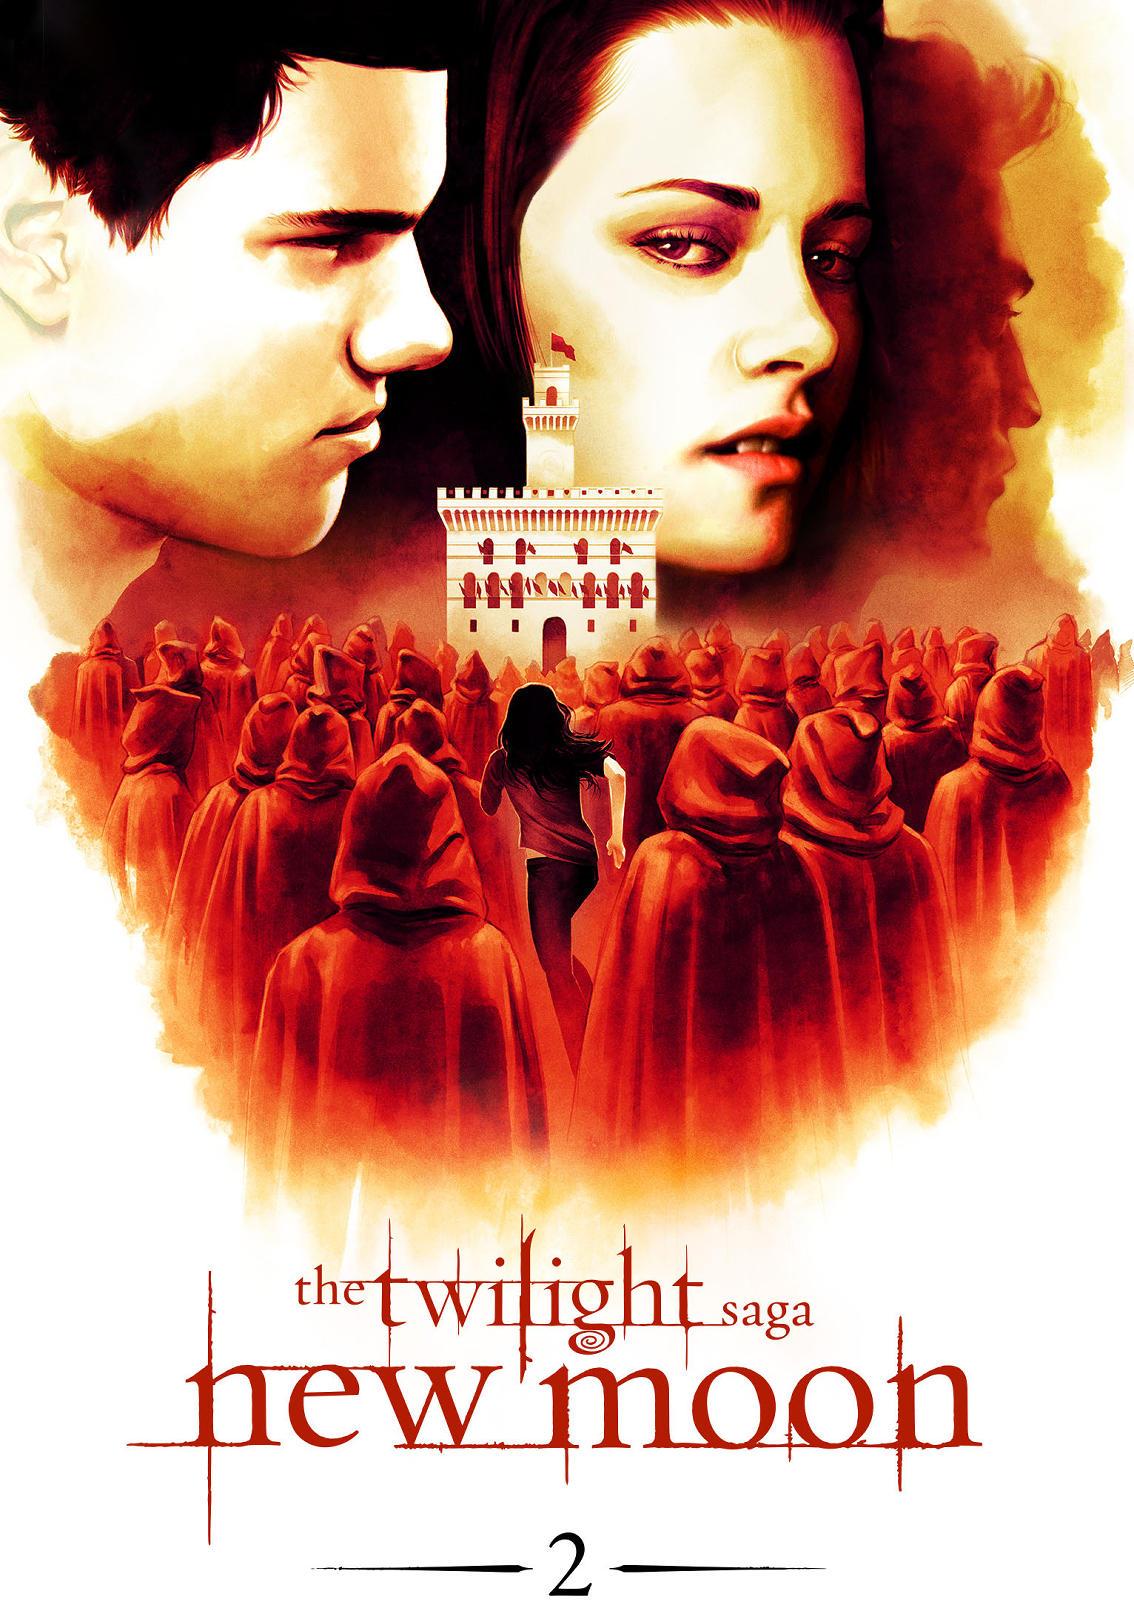 twilight new moon full movie in hindi download 720p